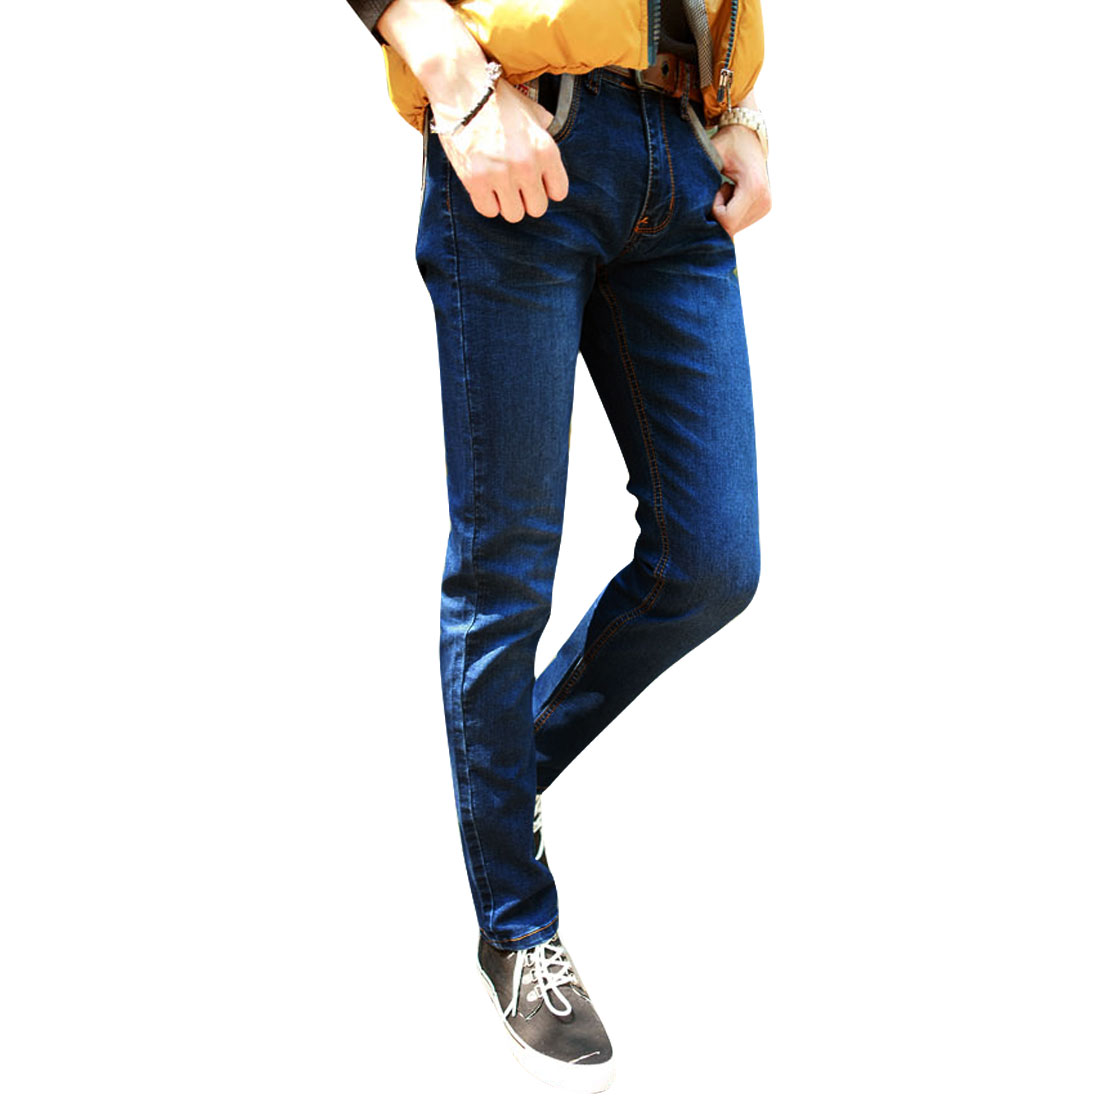 Men Zip Up Waistband Loop Four Pockets Denim Pants Dark Blue W32